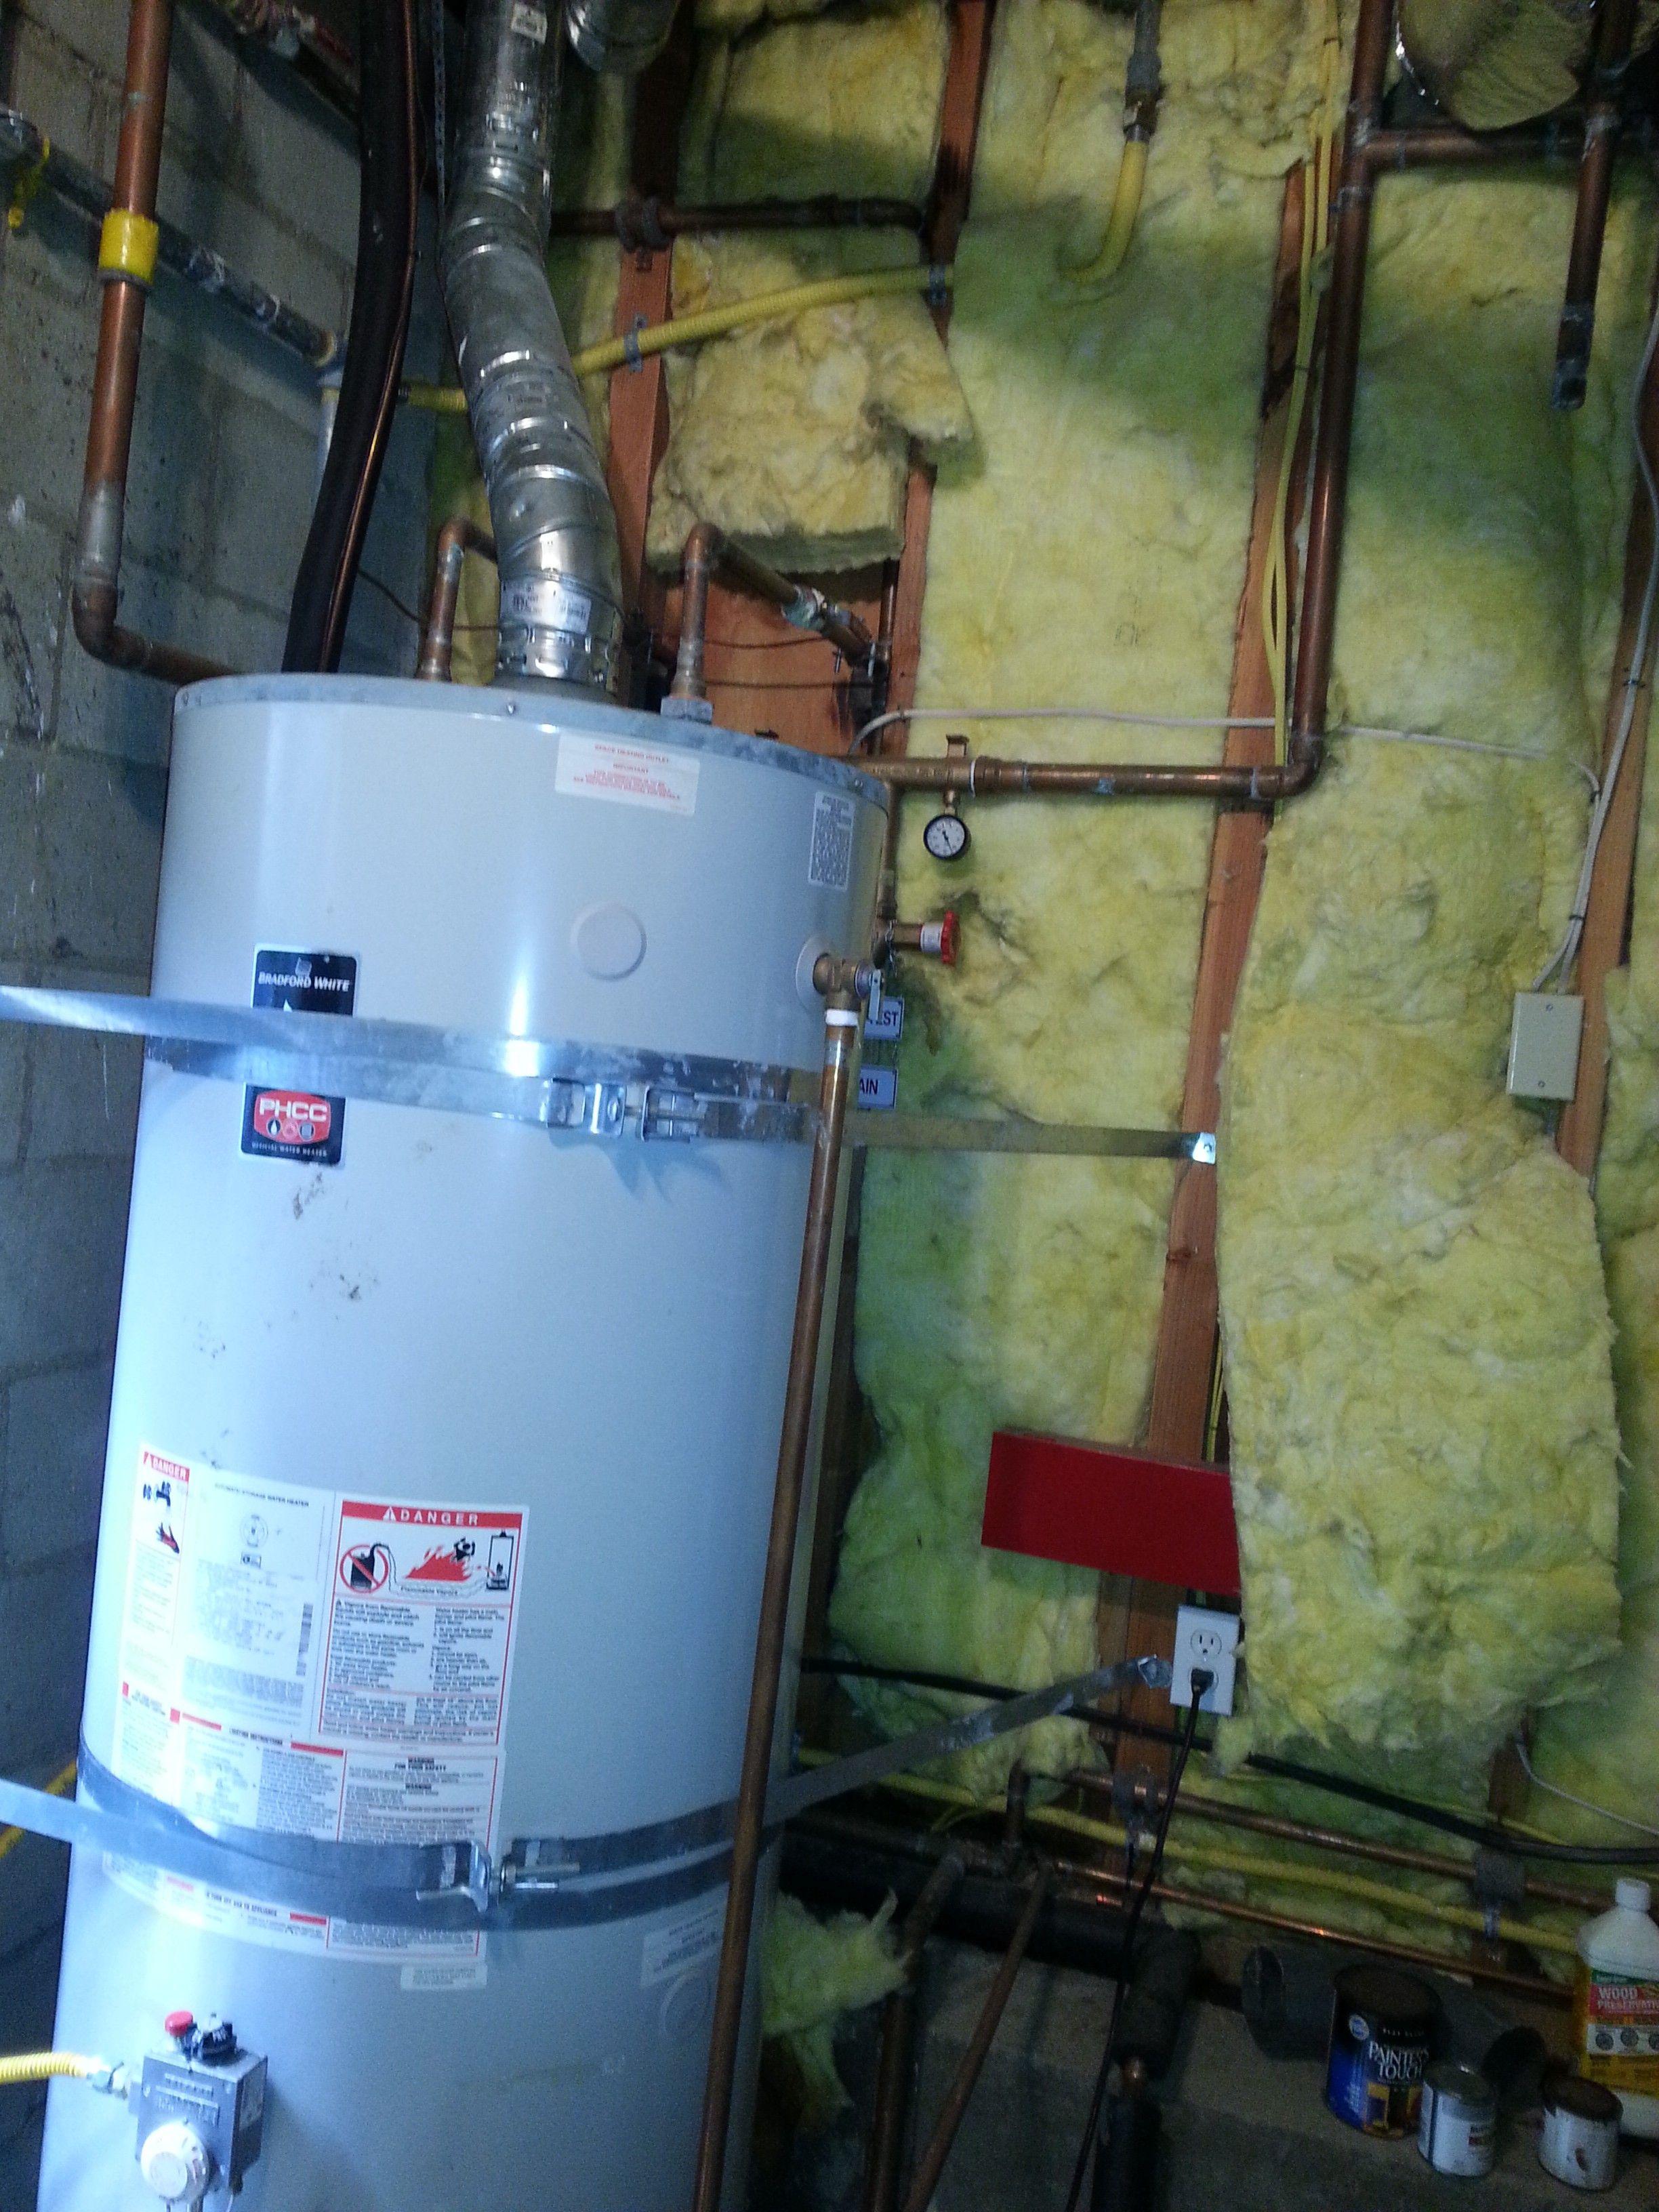 Hot Water Heater Leaking Water Heater Hot Water Heater Hot Water